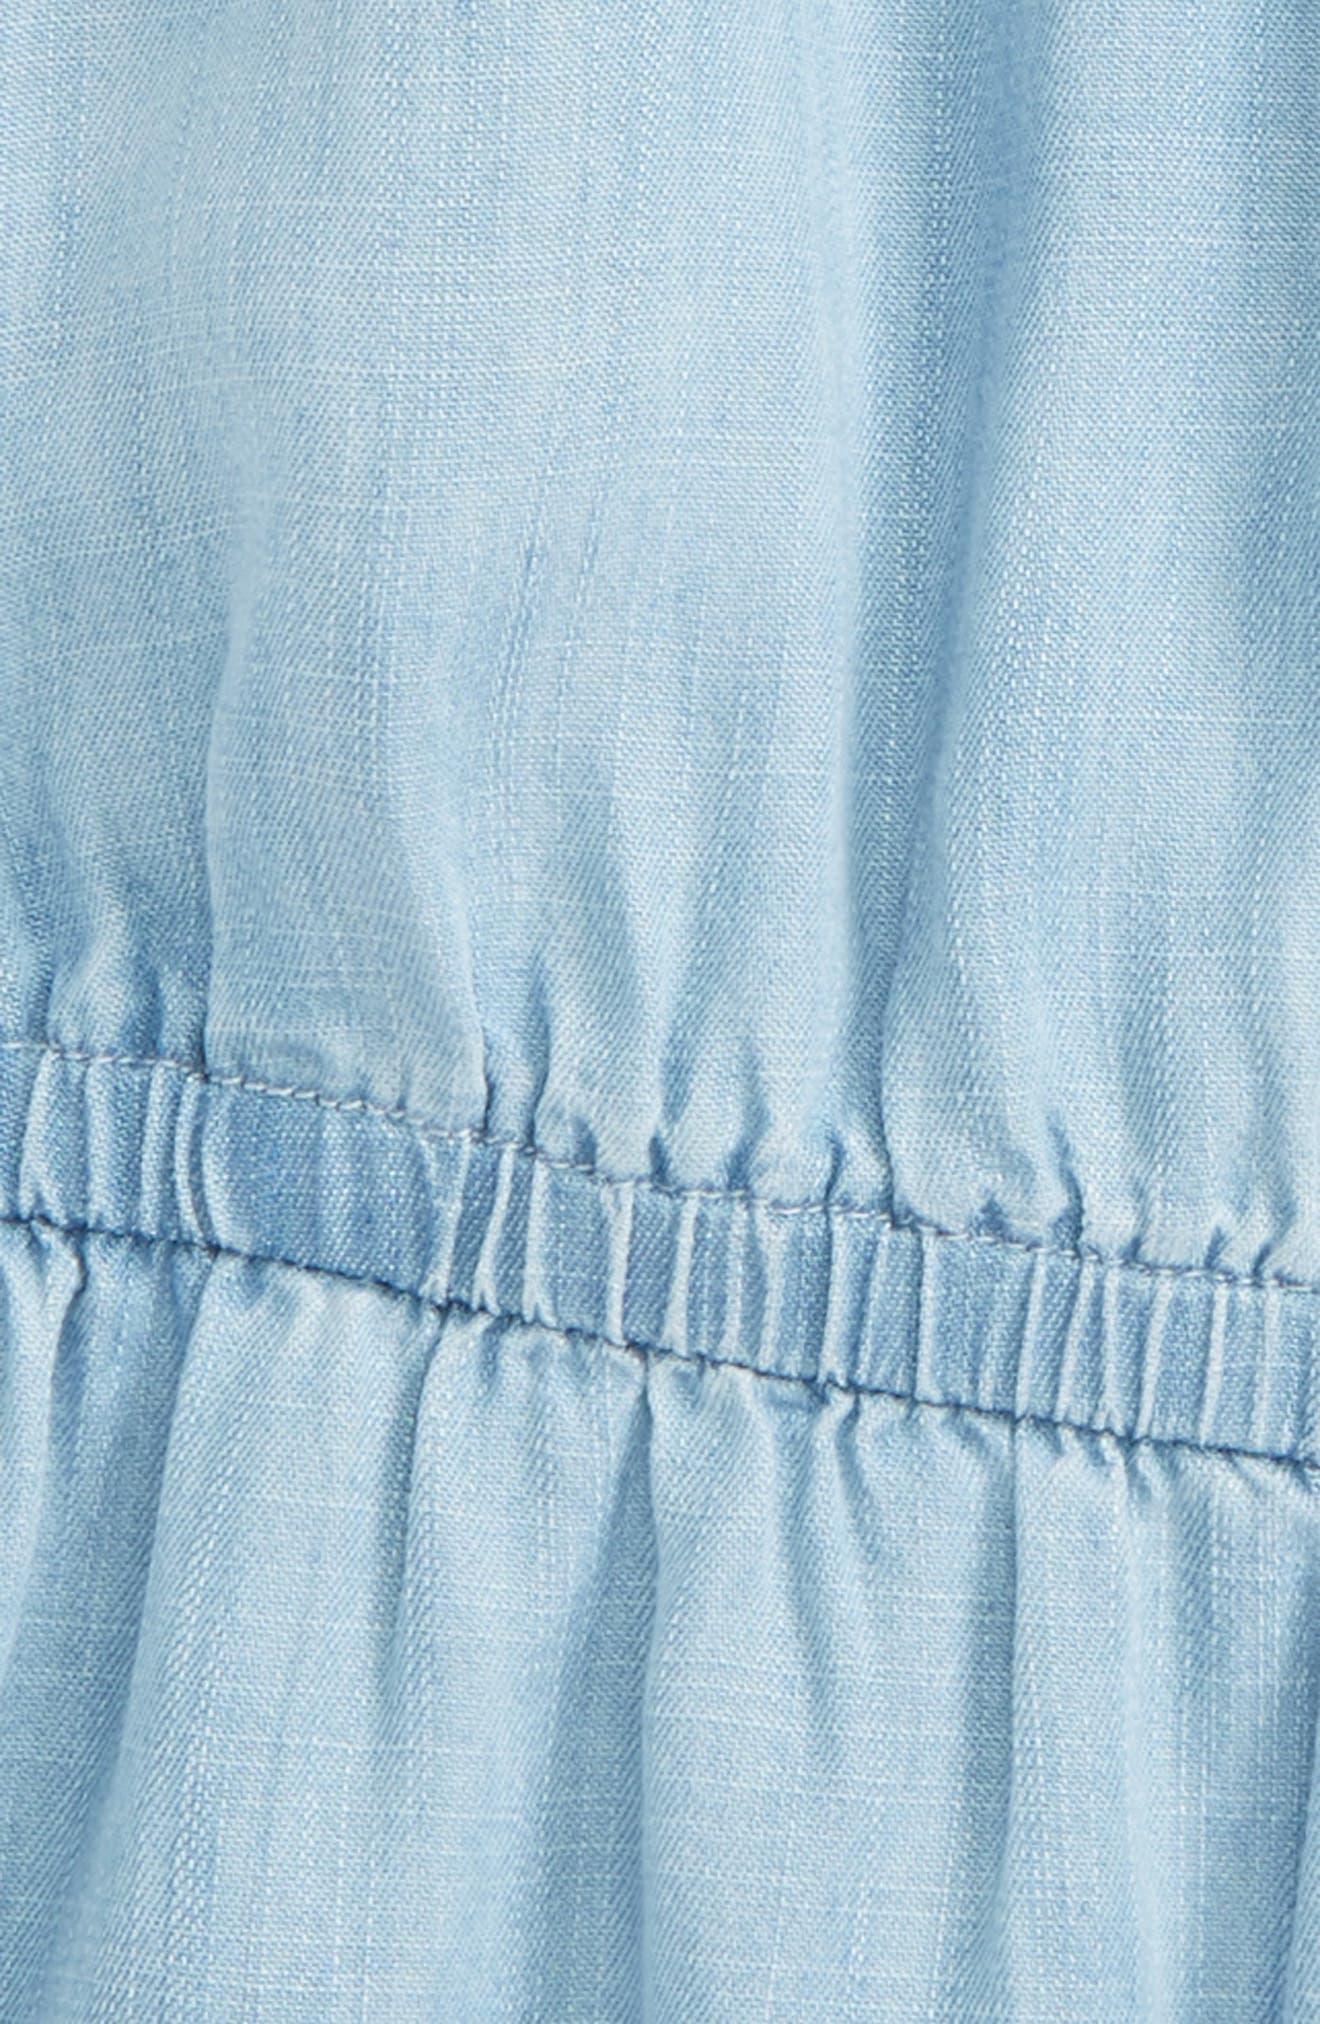 Flutter Sleeve Romper,                             Alternate thumbnail 2, color,                             Blue Wash